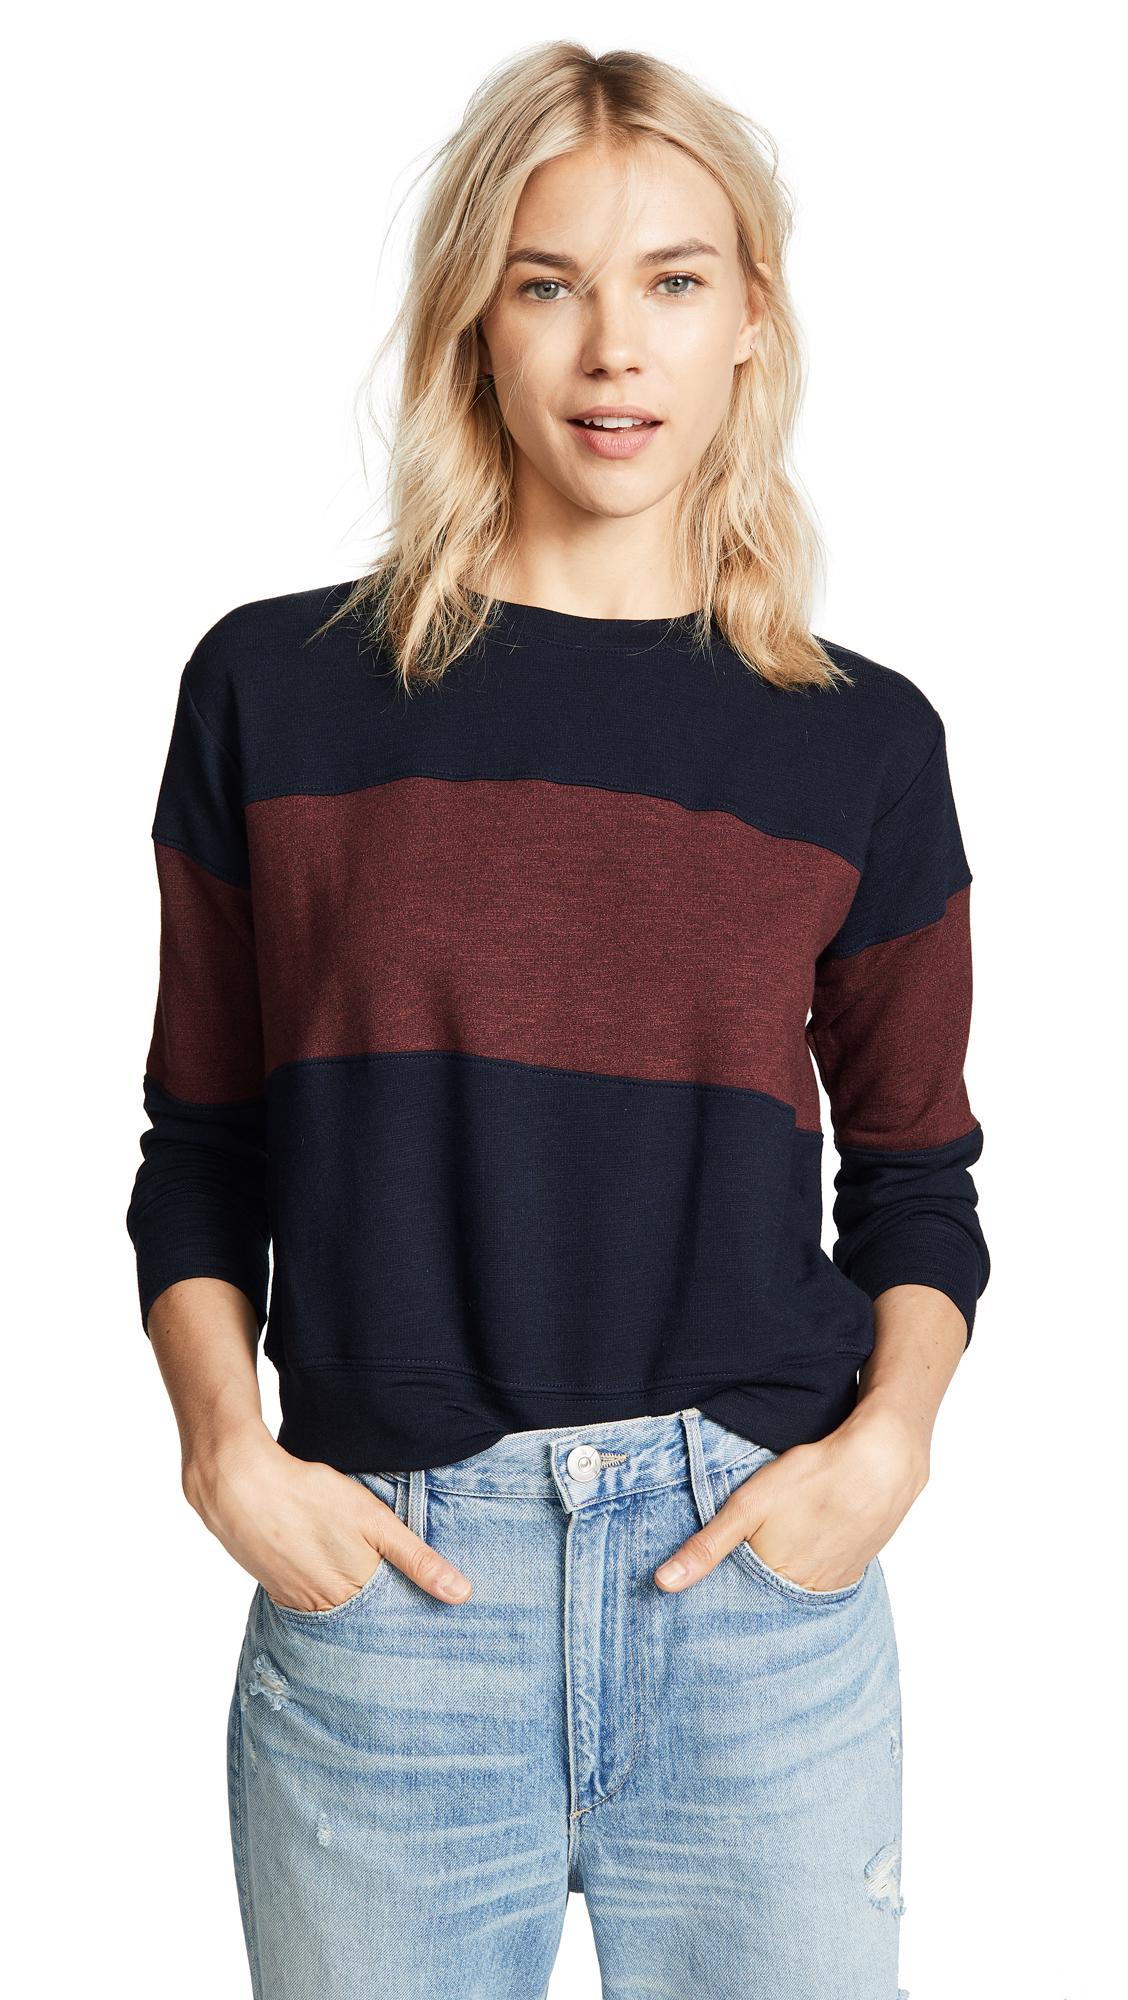 SUNDRY Colorblocked Sweatshirt In Midnight/Marsala